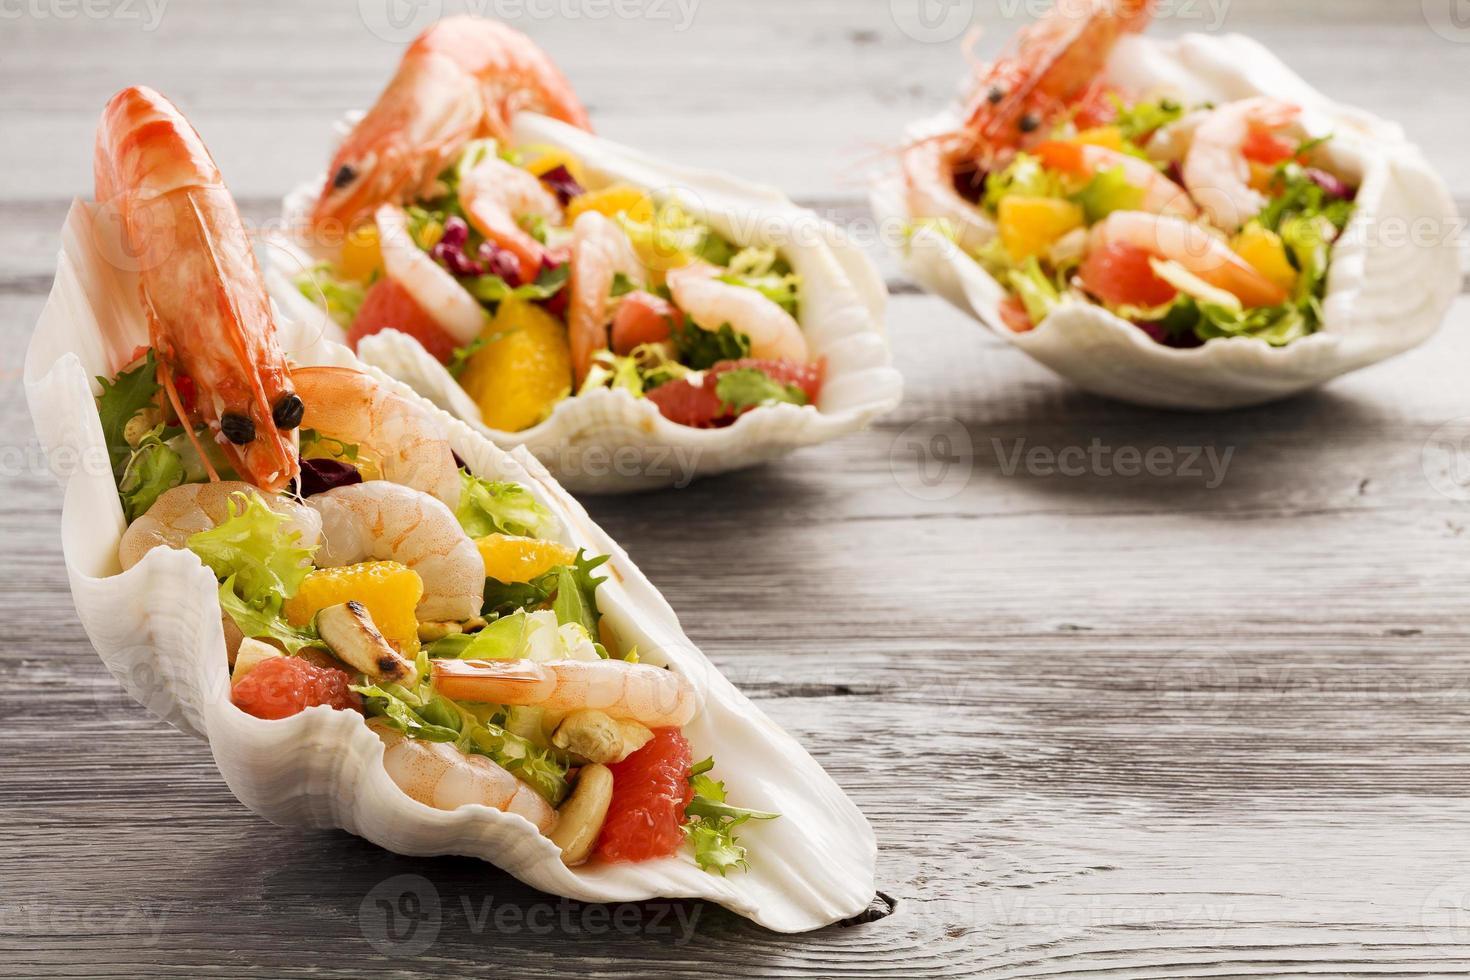 Shrimp salad with grapefruit, orange and roasted peanuts. - Serv photo